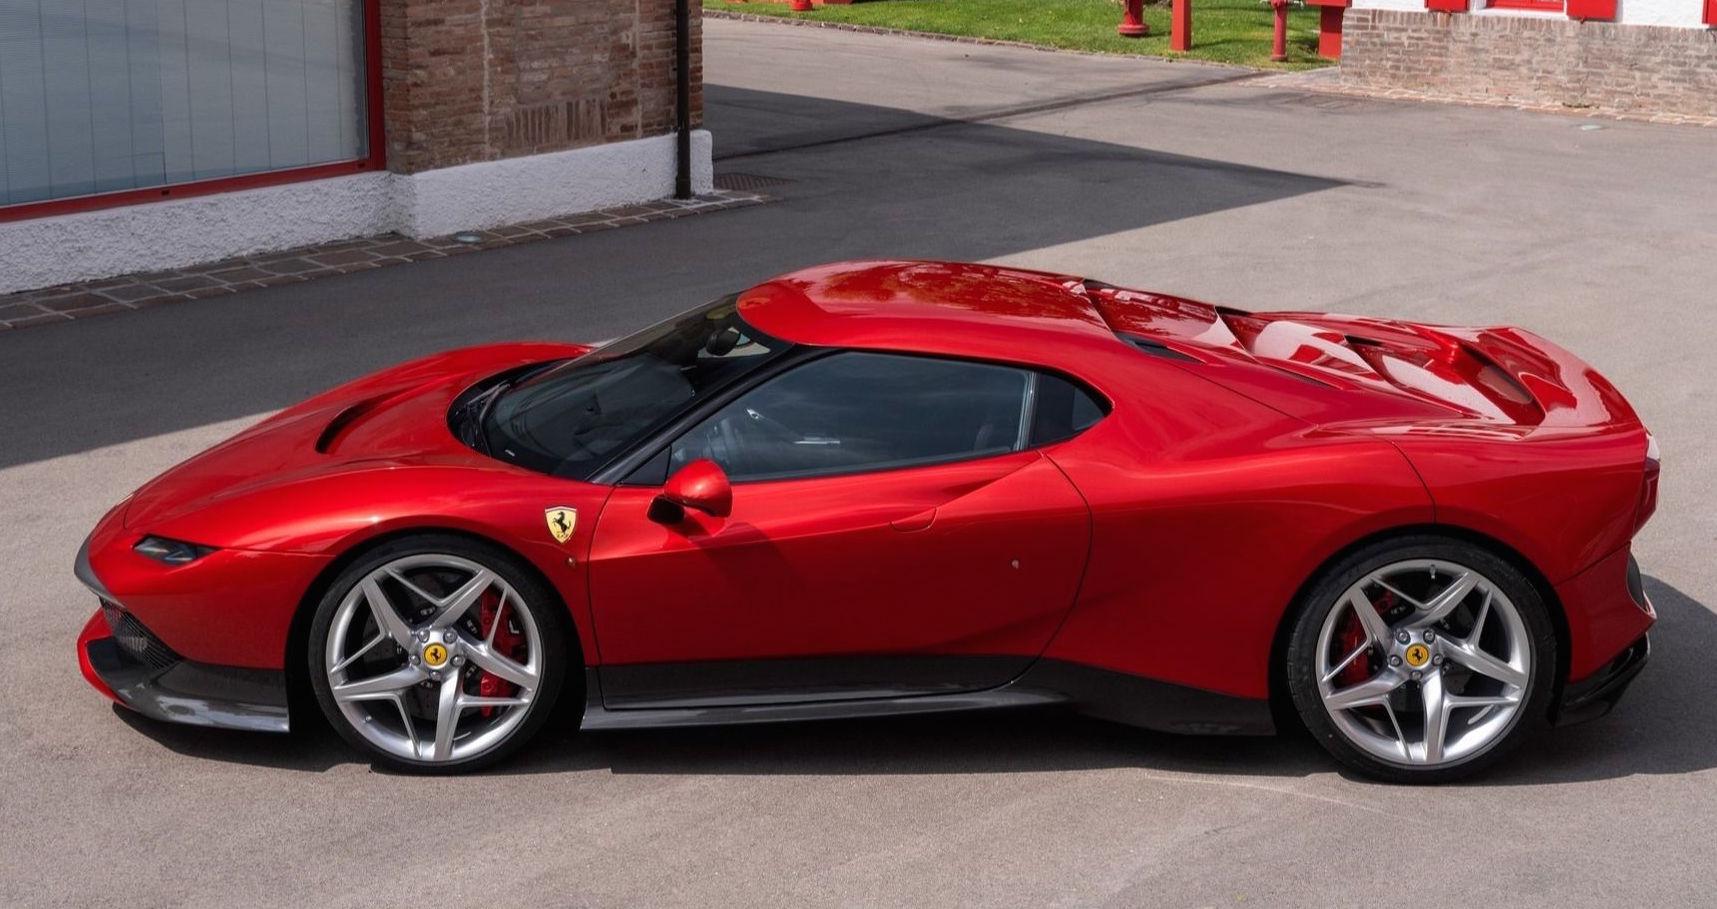 Wujud Ferrari SP38 Deborah yang Hanya Ada Satu Di Dunia